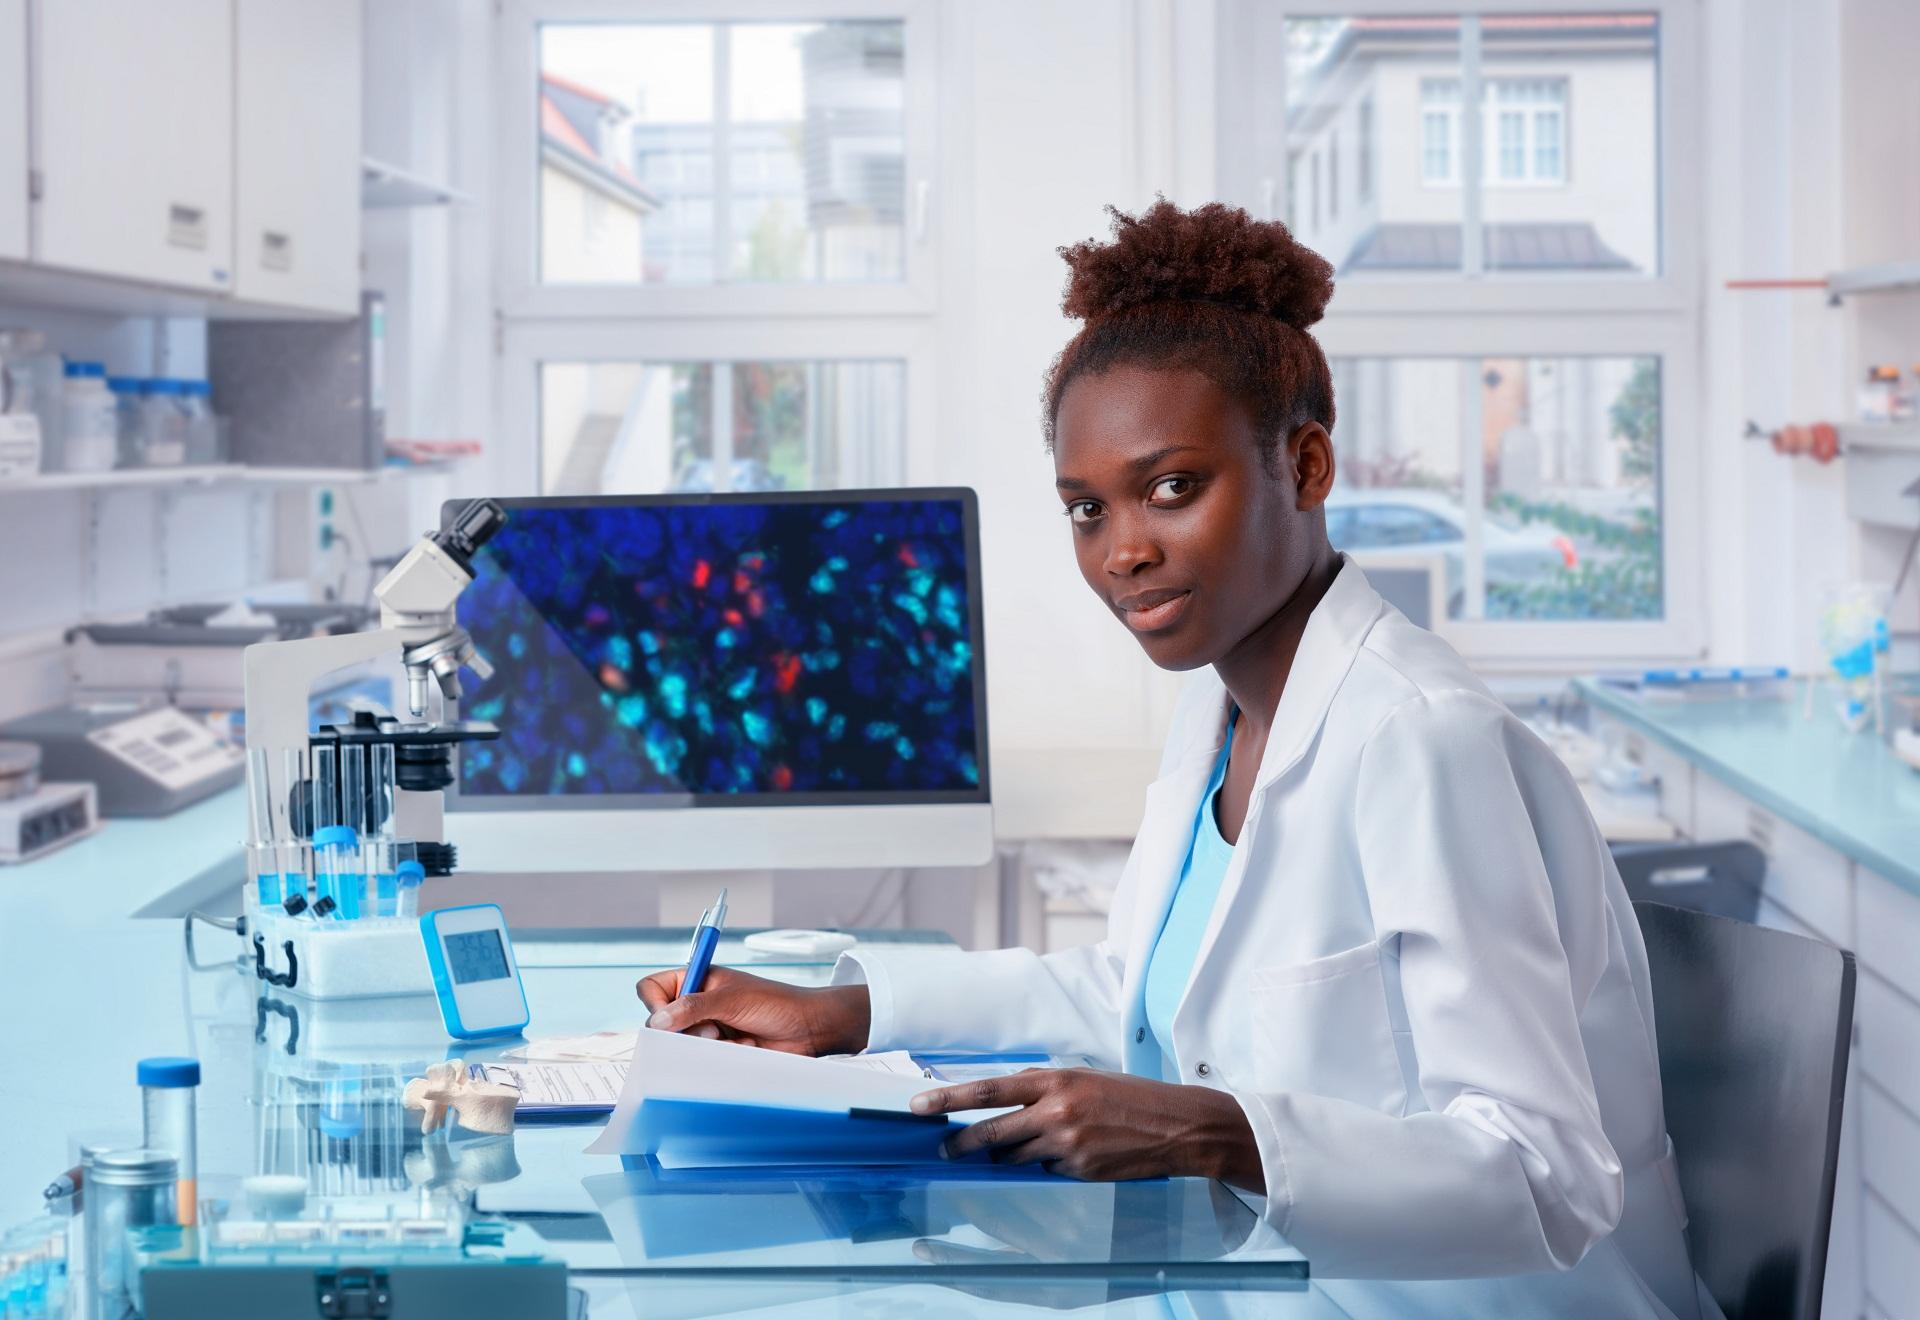 Epigenética o que é? Como funciona a epigenética?